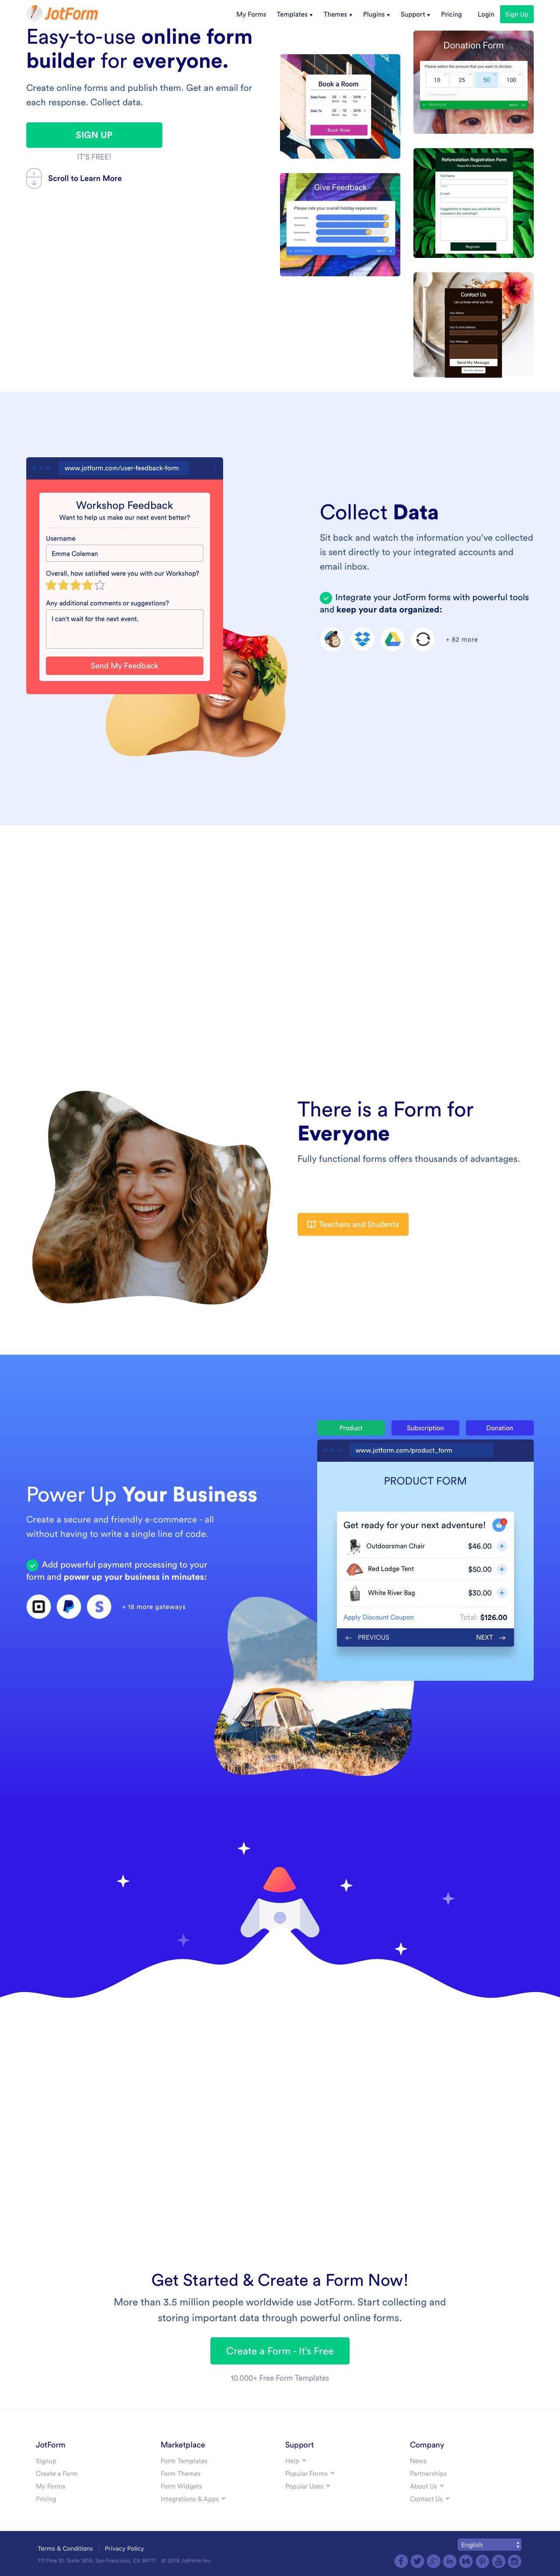 Screenshot of jotform.com - Online Form Builder & Form Creator | JotForm - captured June 4, 2018